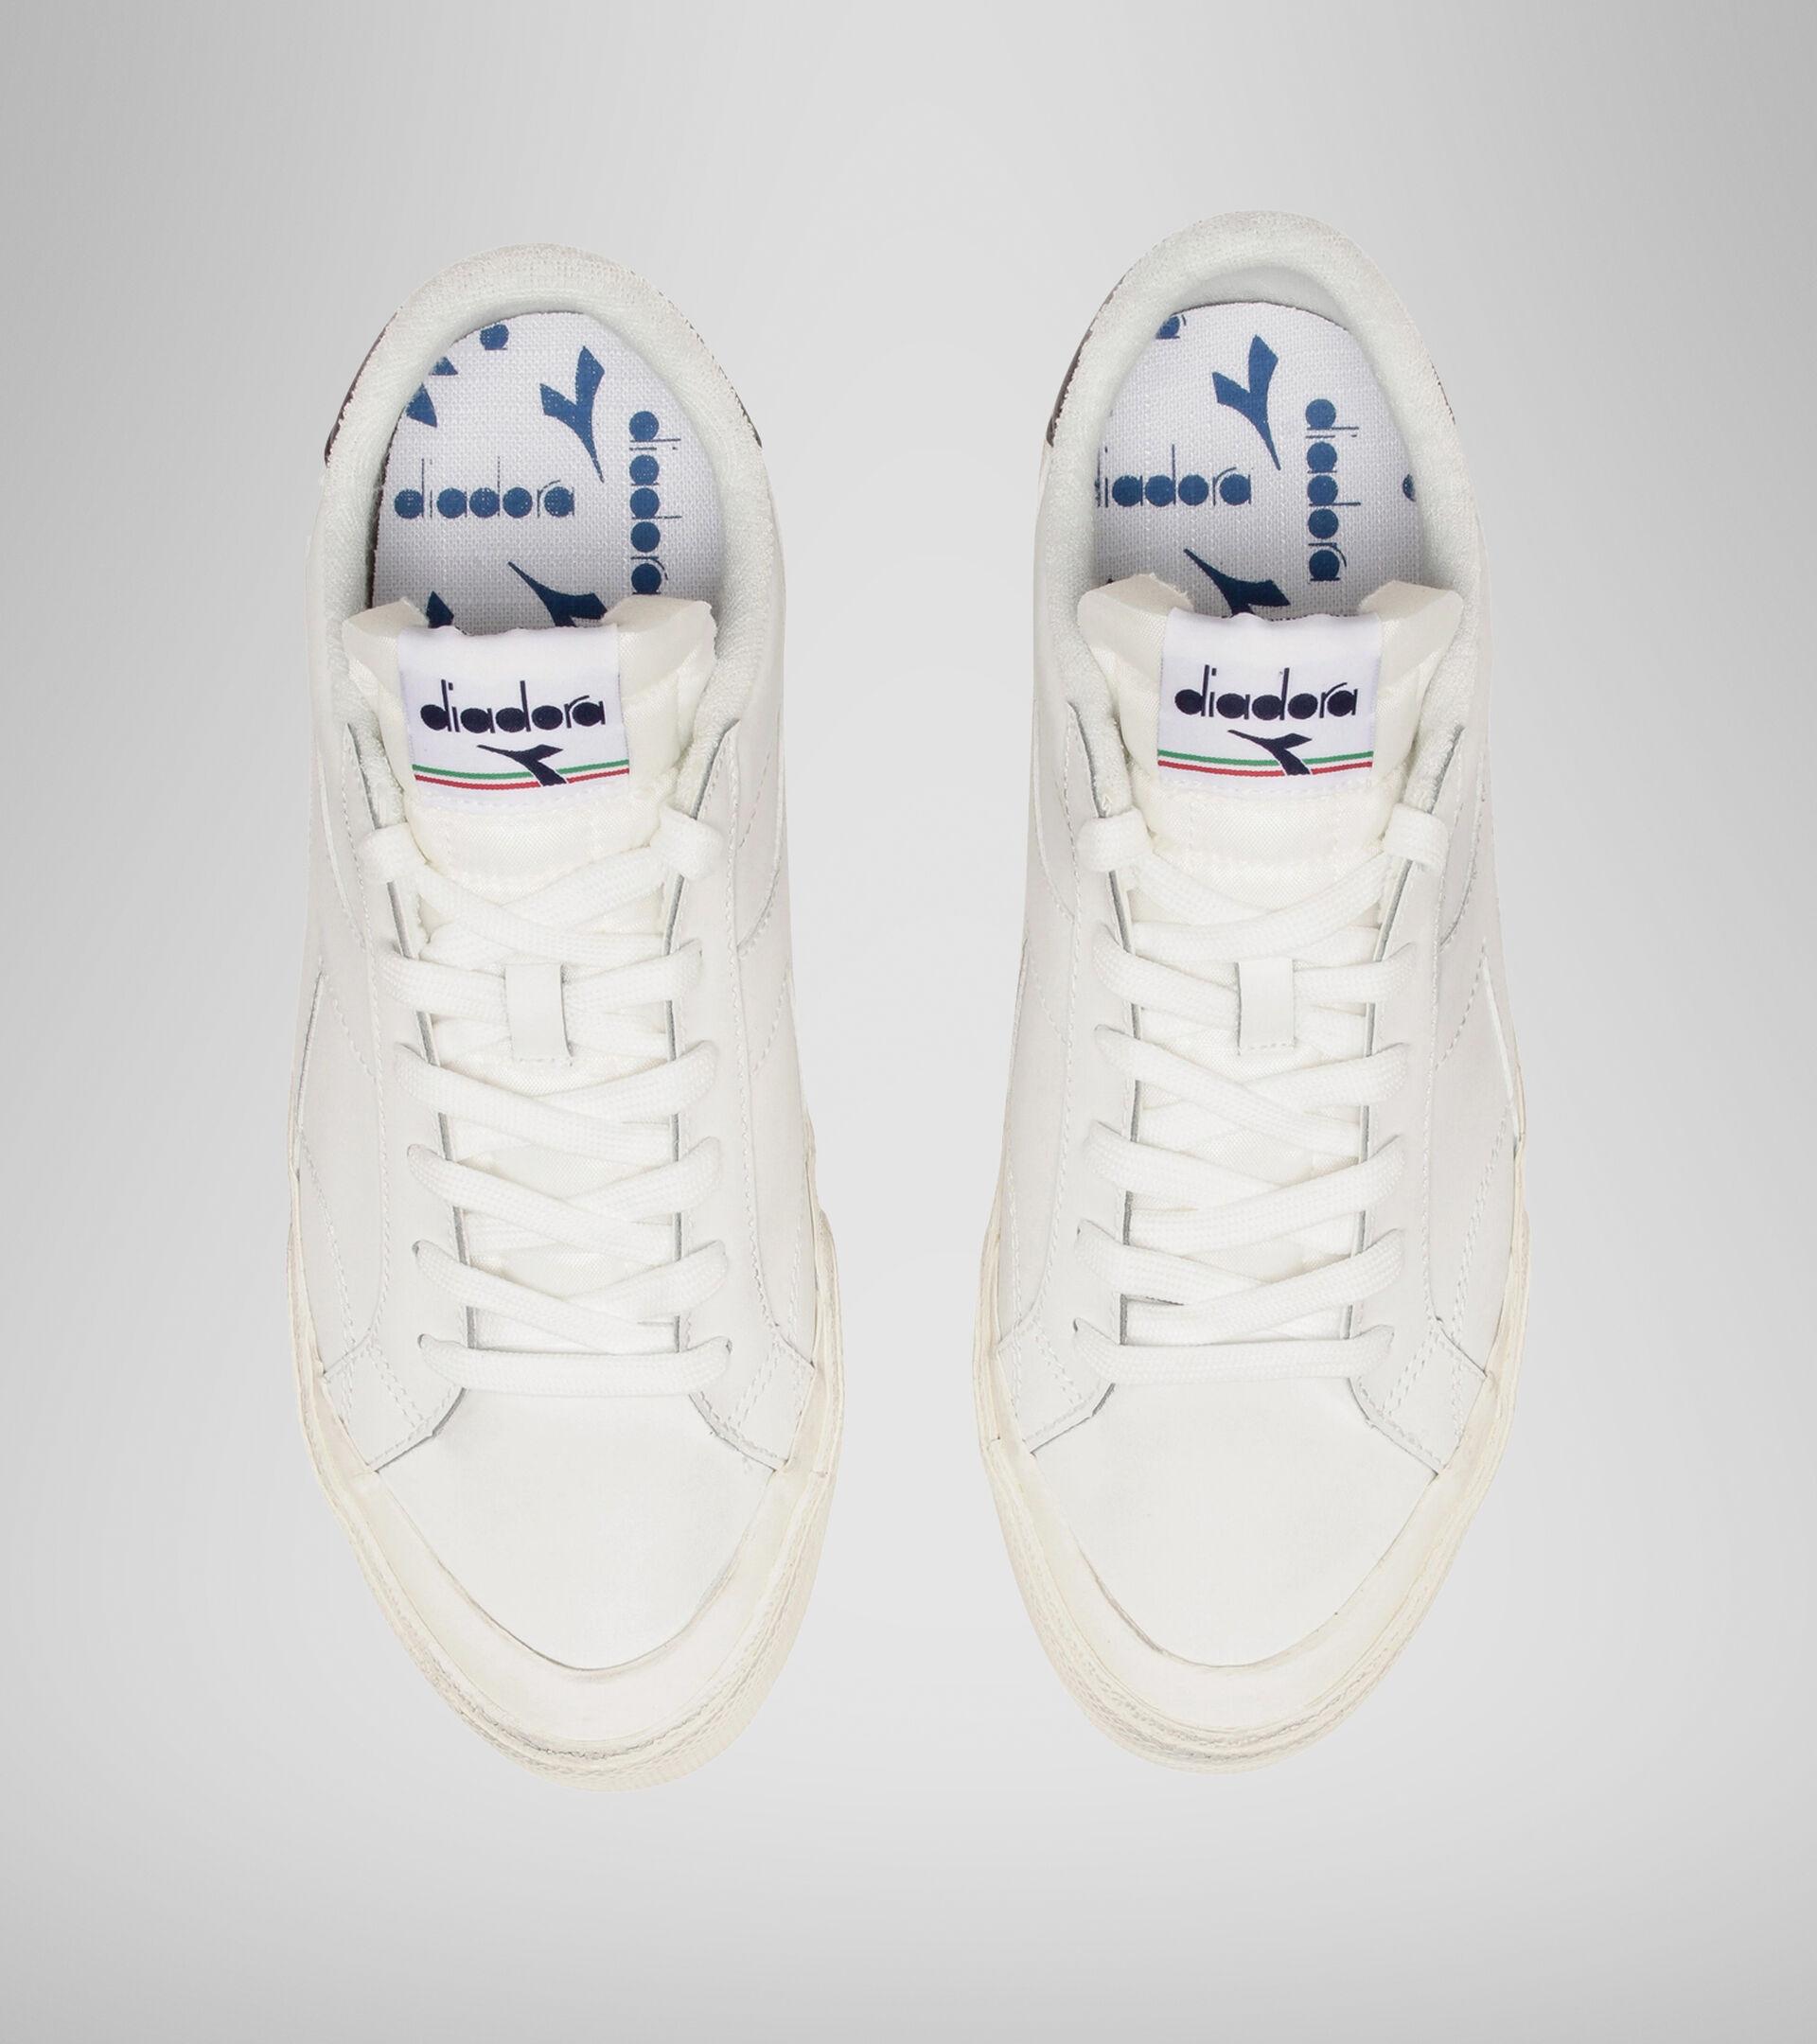 Footwear Sportswear UNISEX MELODY LEATHER DIRTY BLANCO/NEGRO IRIS Diadora